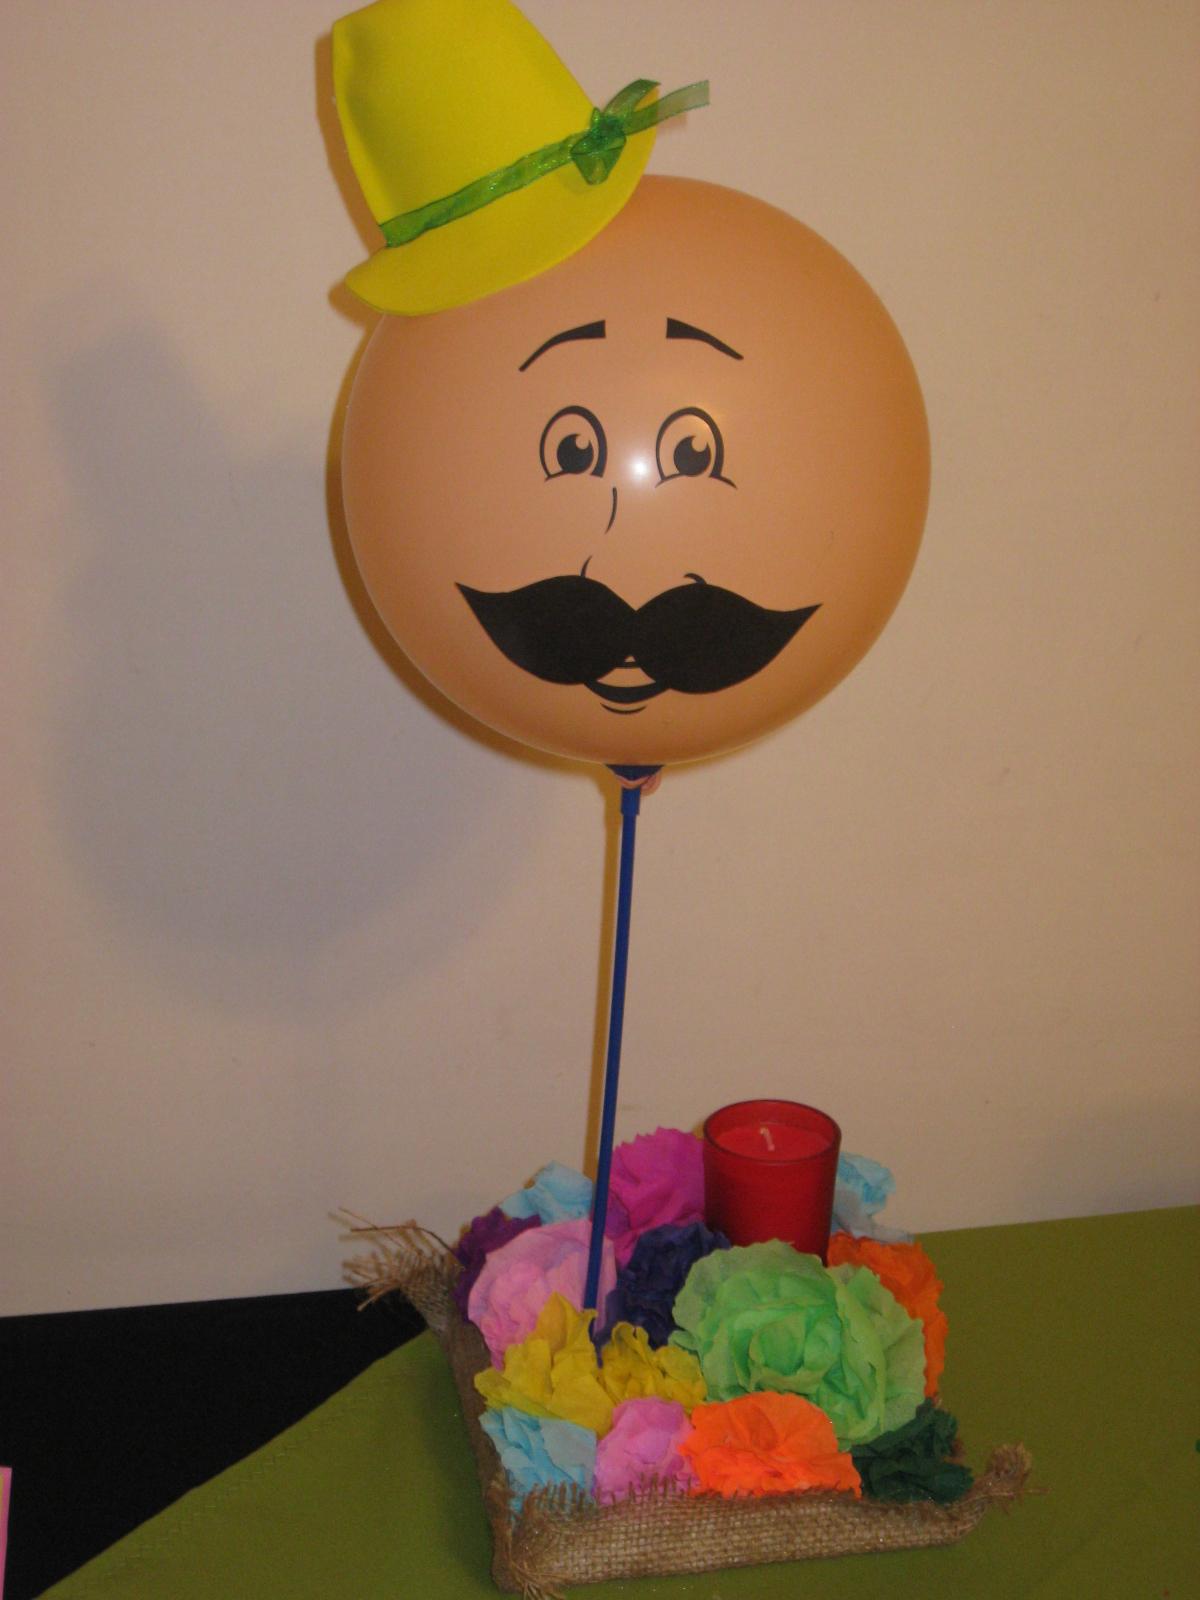 Decoraci n para fiesta mexicana pancho villa tu p rty - Decoracion para foto ...